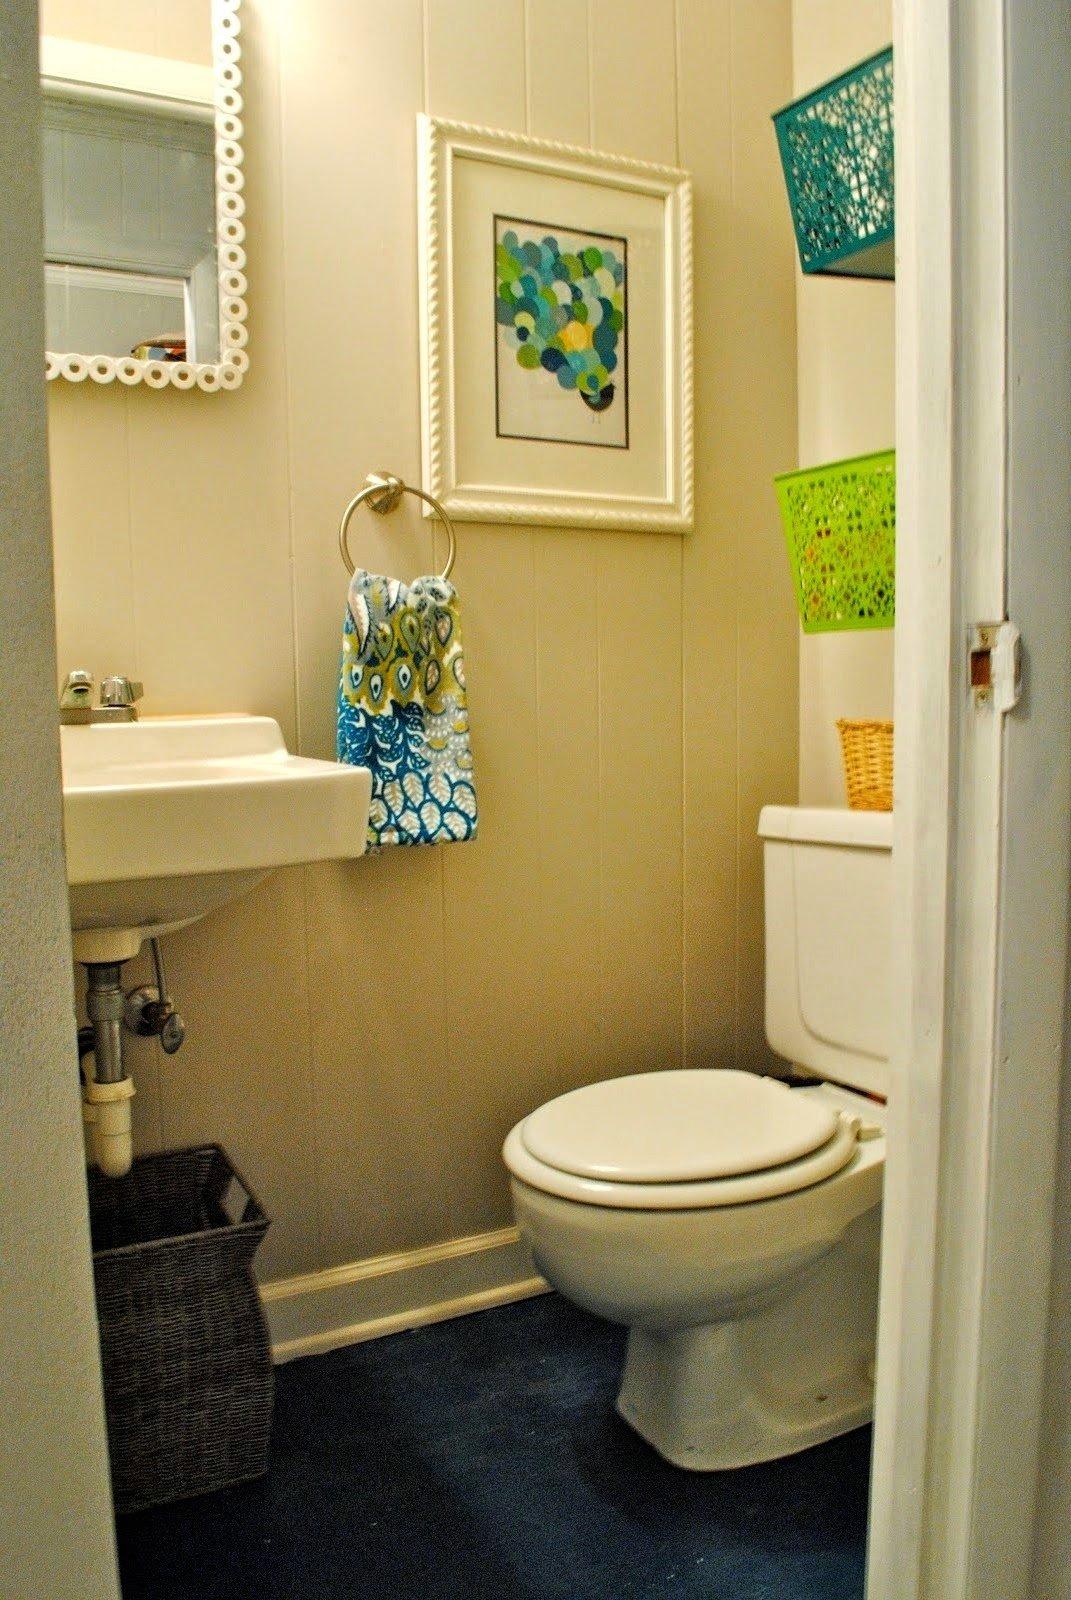 10 Attractive Small Bathroom Decorating Ideas Pictures brilliant decorate small bathroom ideas in interior remodel concept